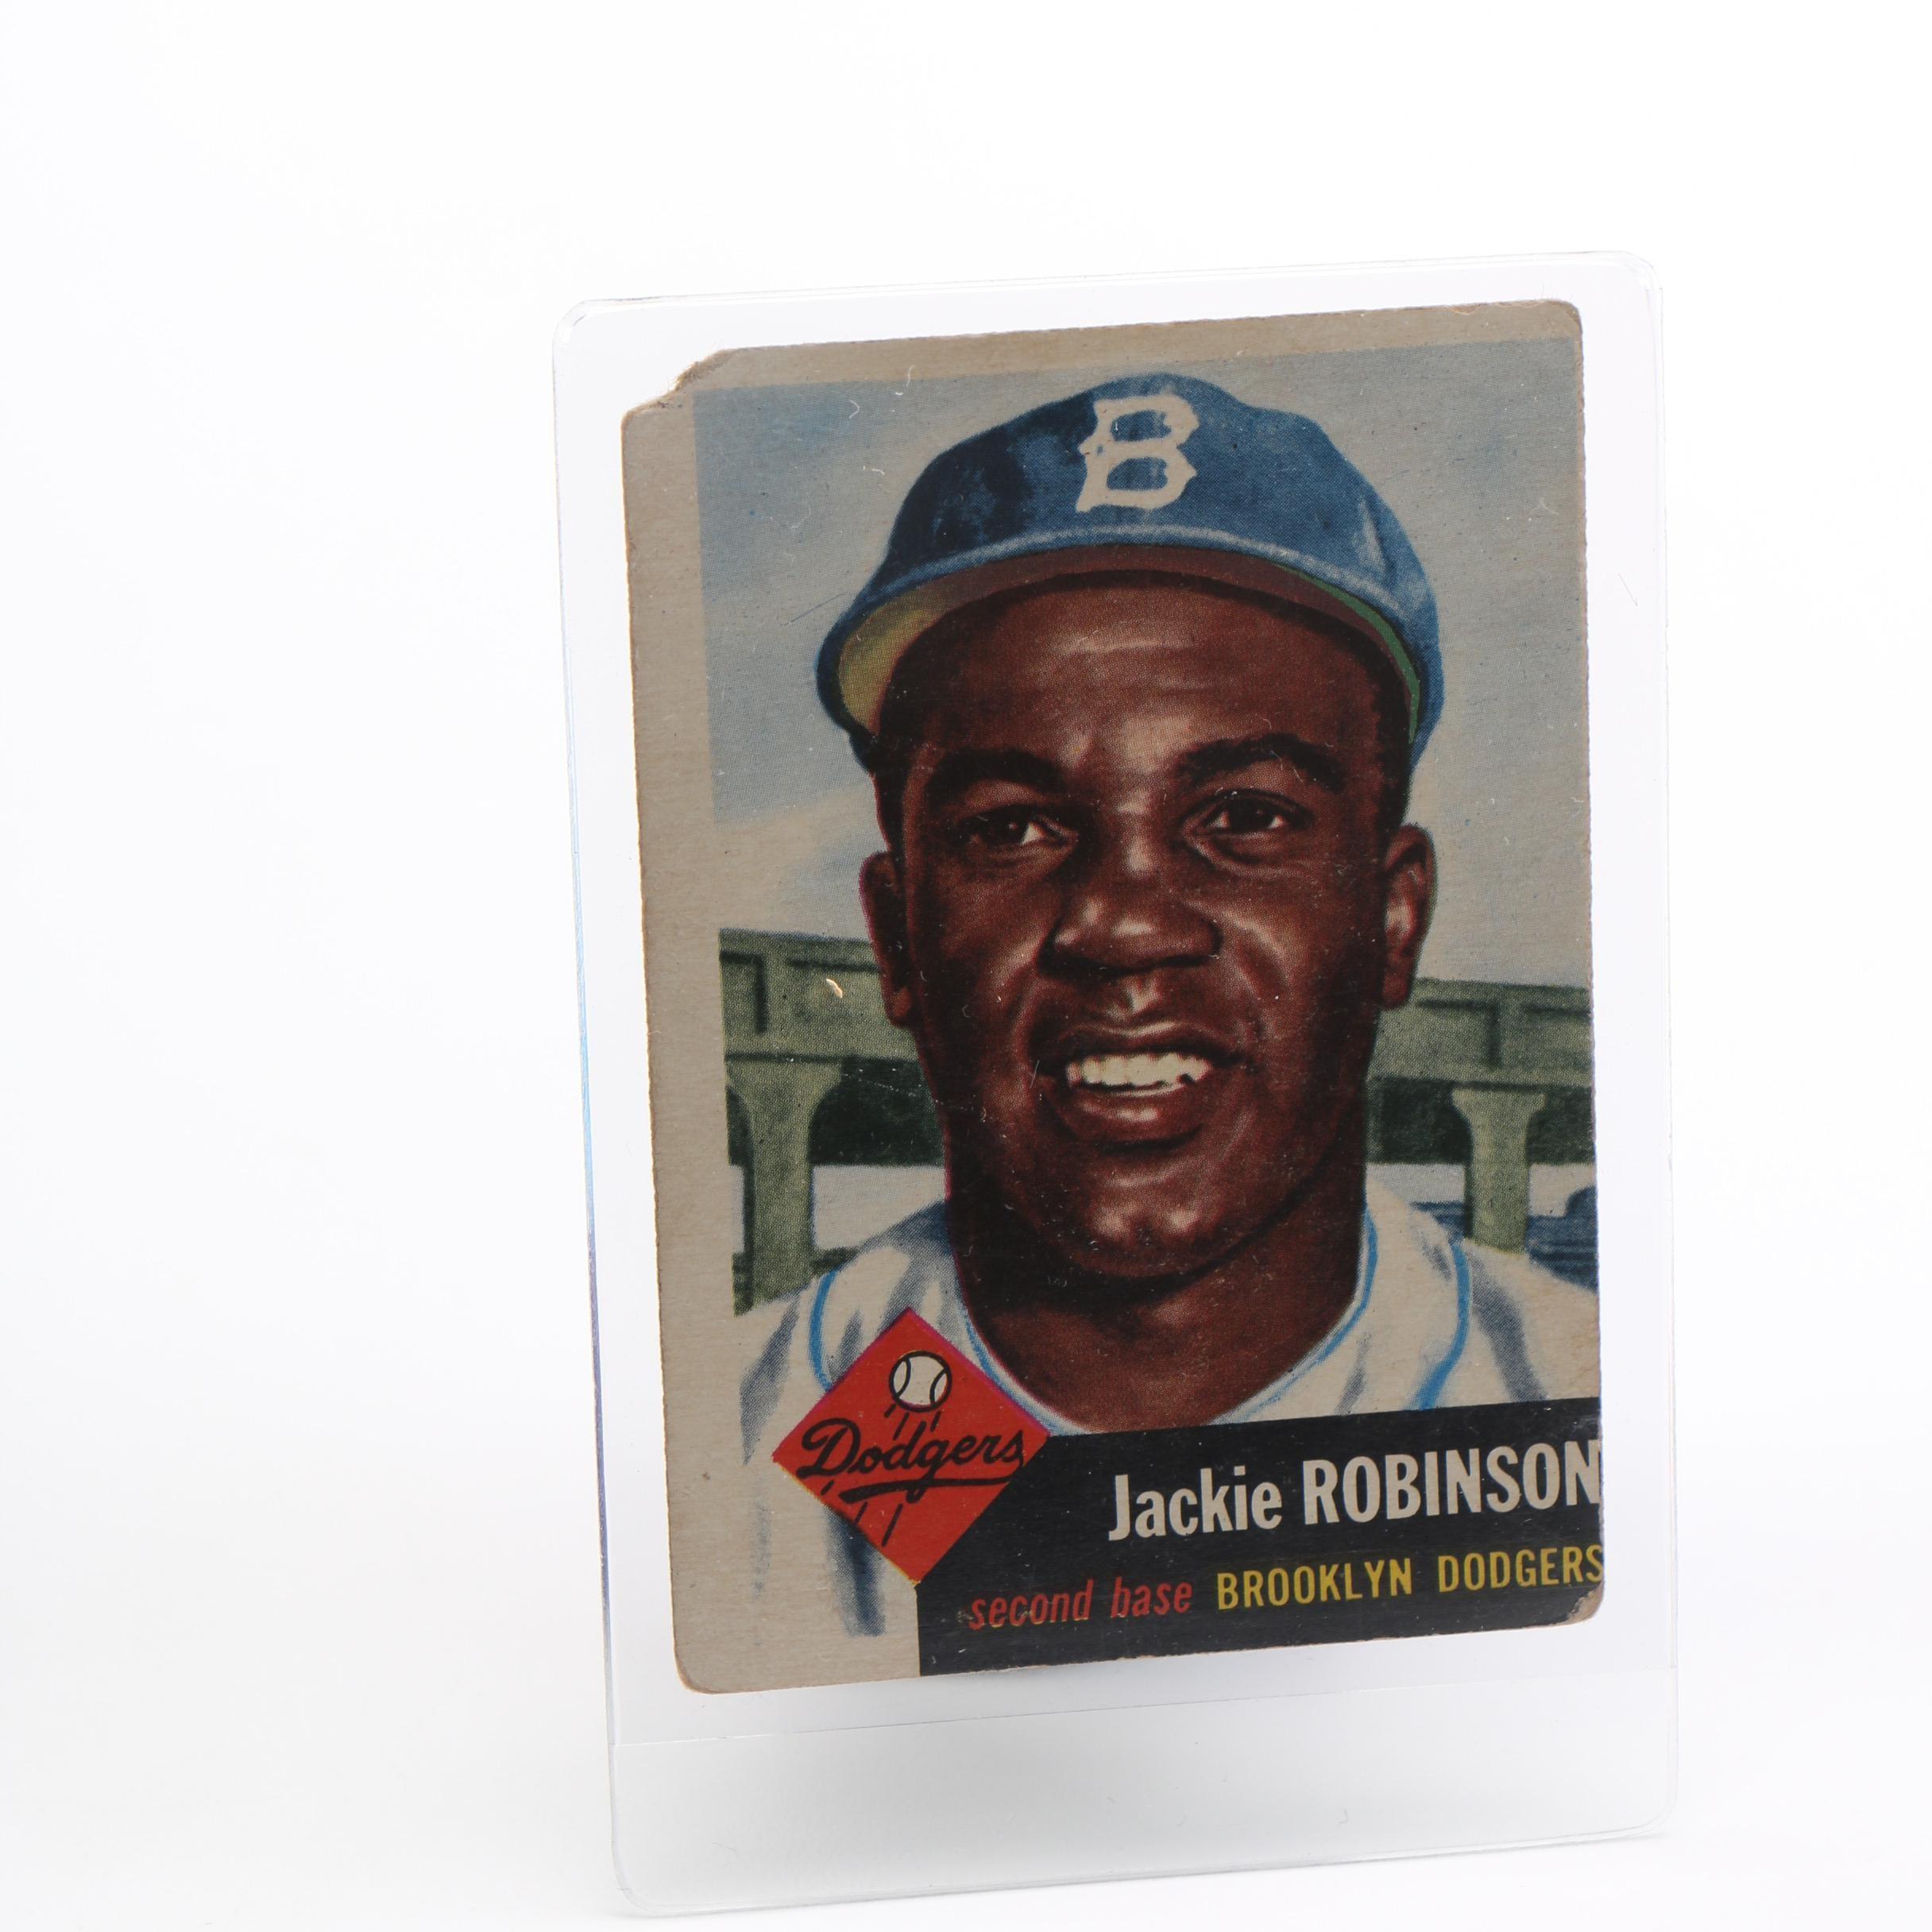 1953 Topps Jackie Robinson Card